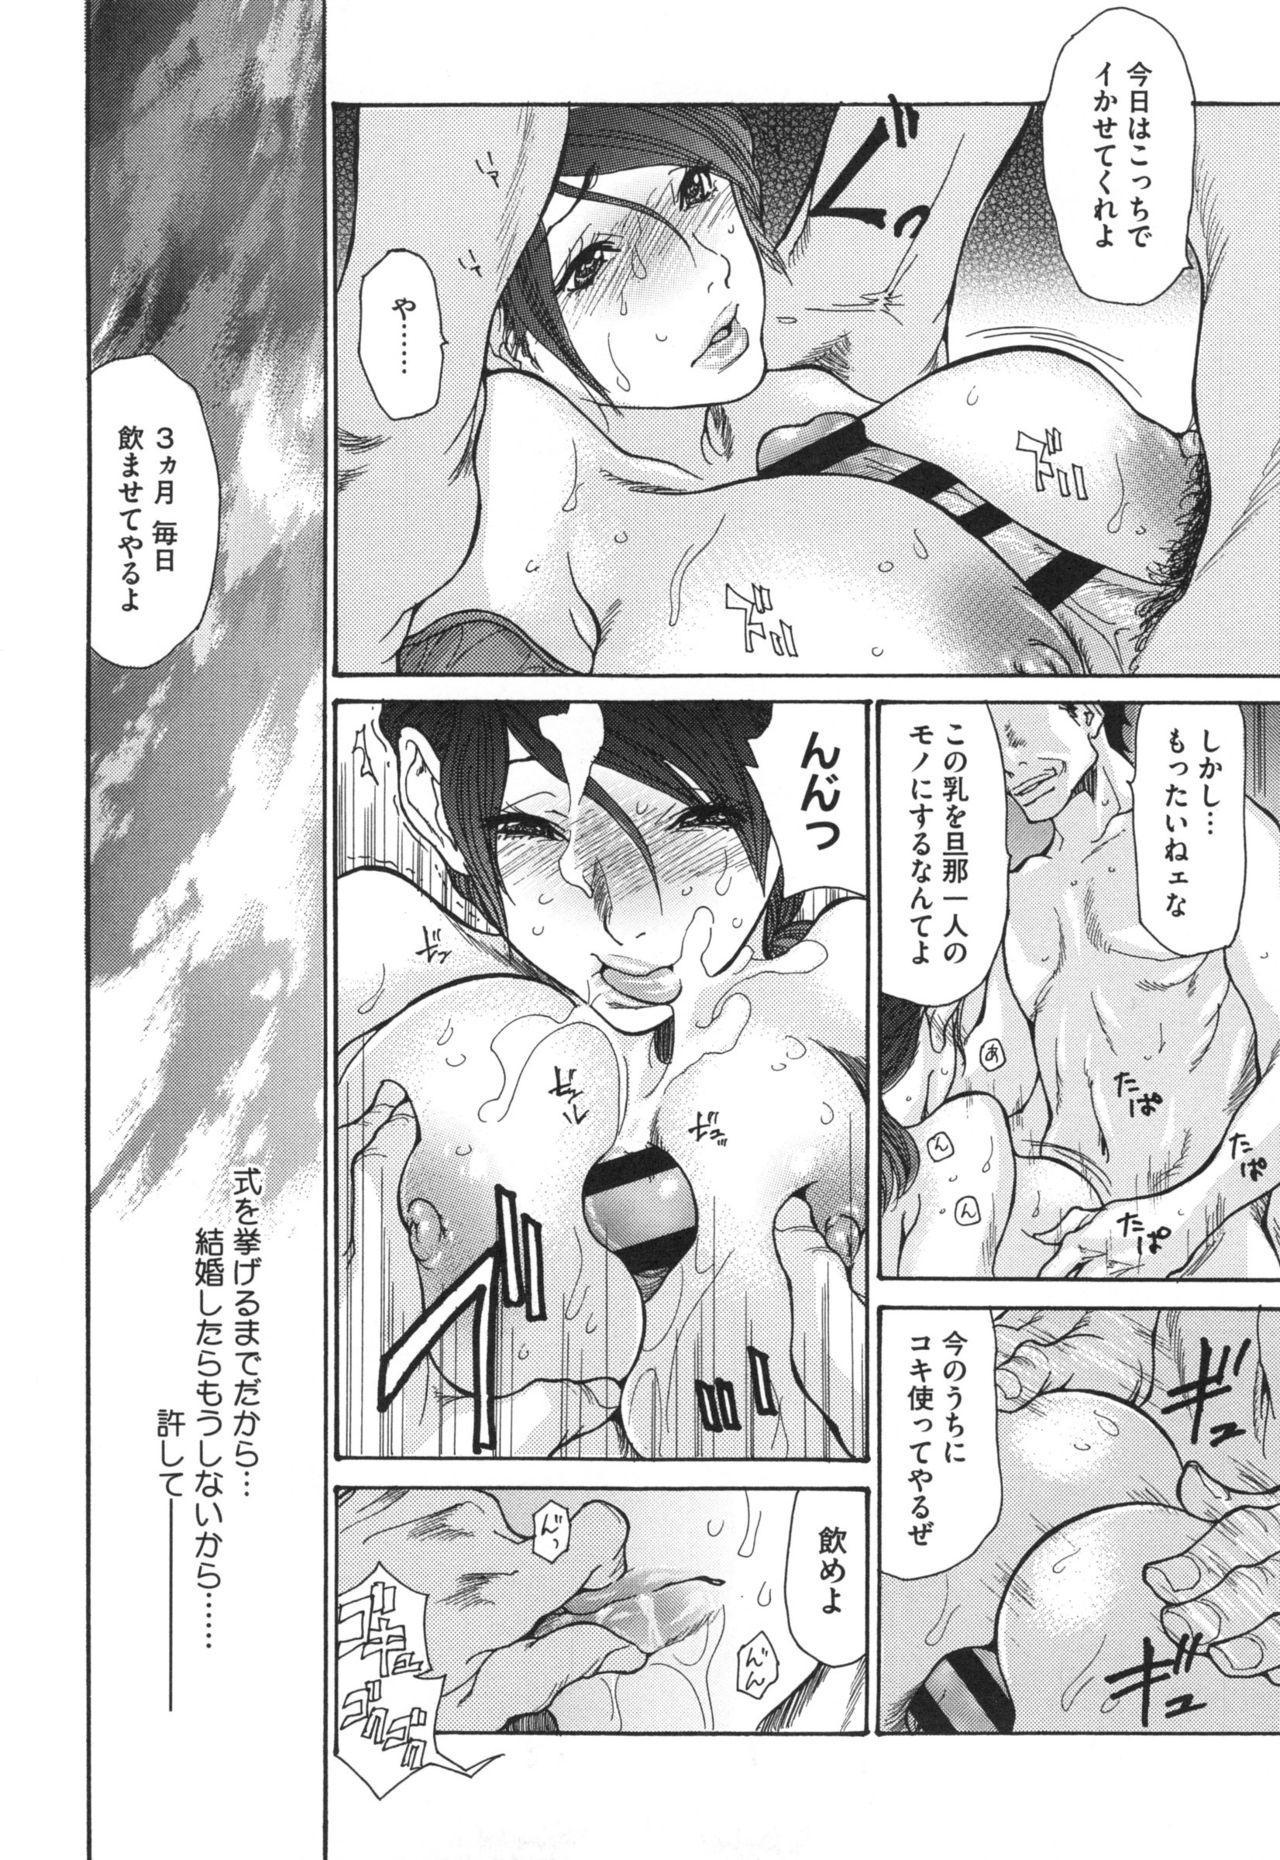 Niku-zuma Netorare Maniacs 58